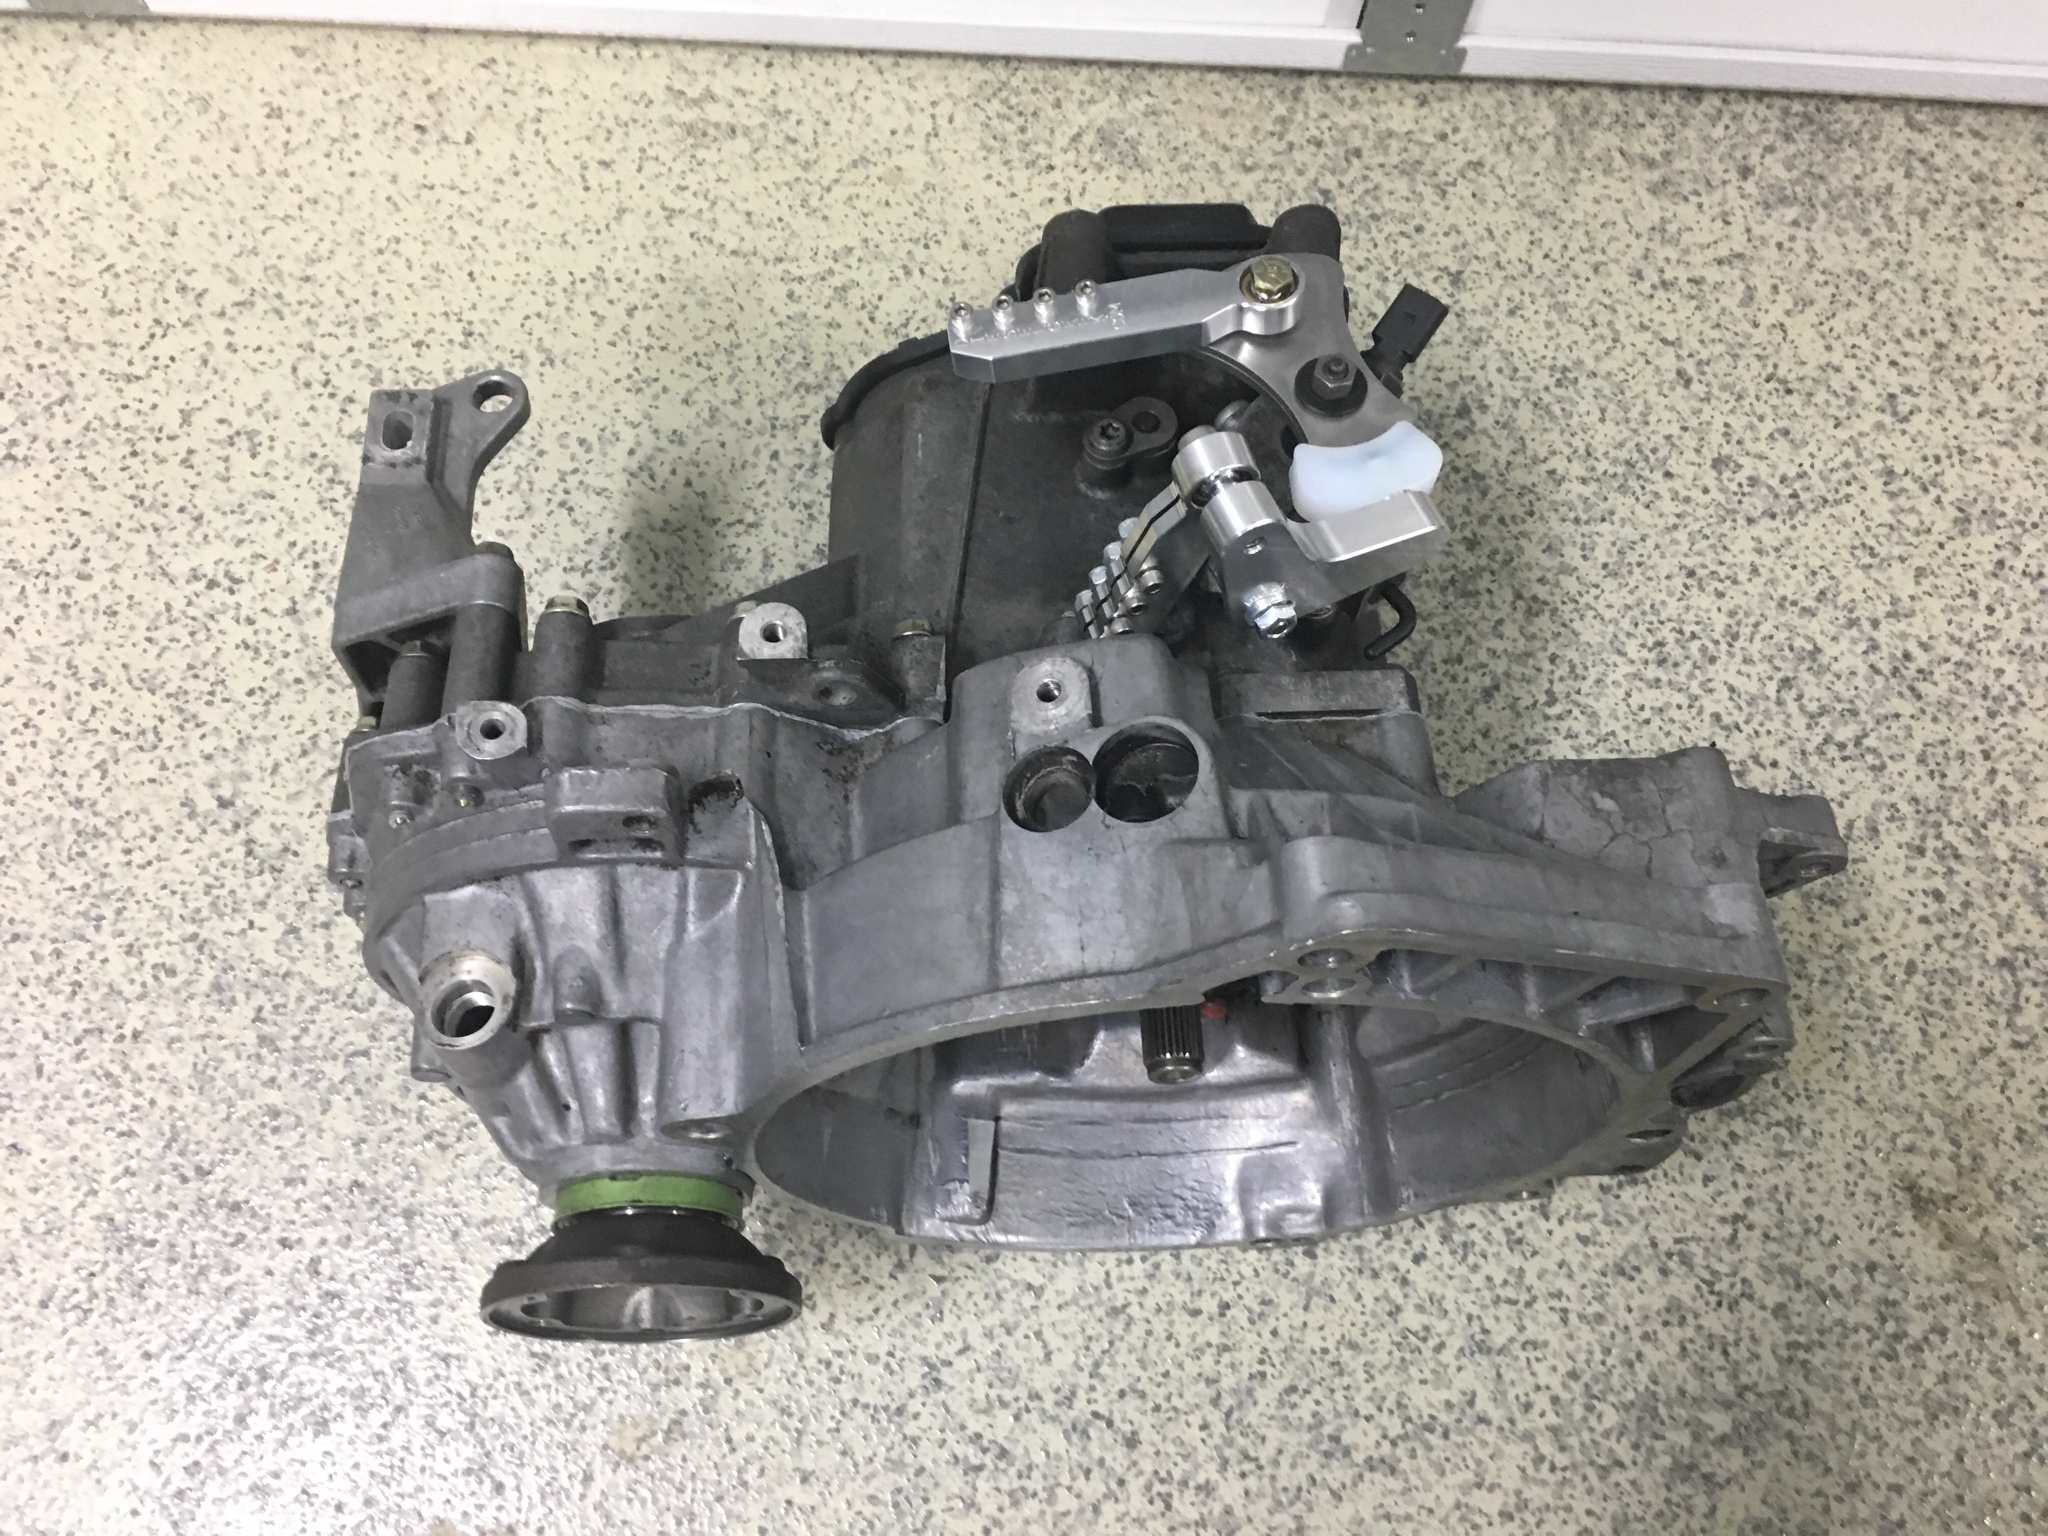 Vwvortexcom 36 24v Vr6 Swap Questions Links Jetta Engine Diagram Stock 12v Flywheel With Arp Bolts I Used A Mk4 02j Starter